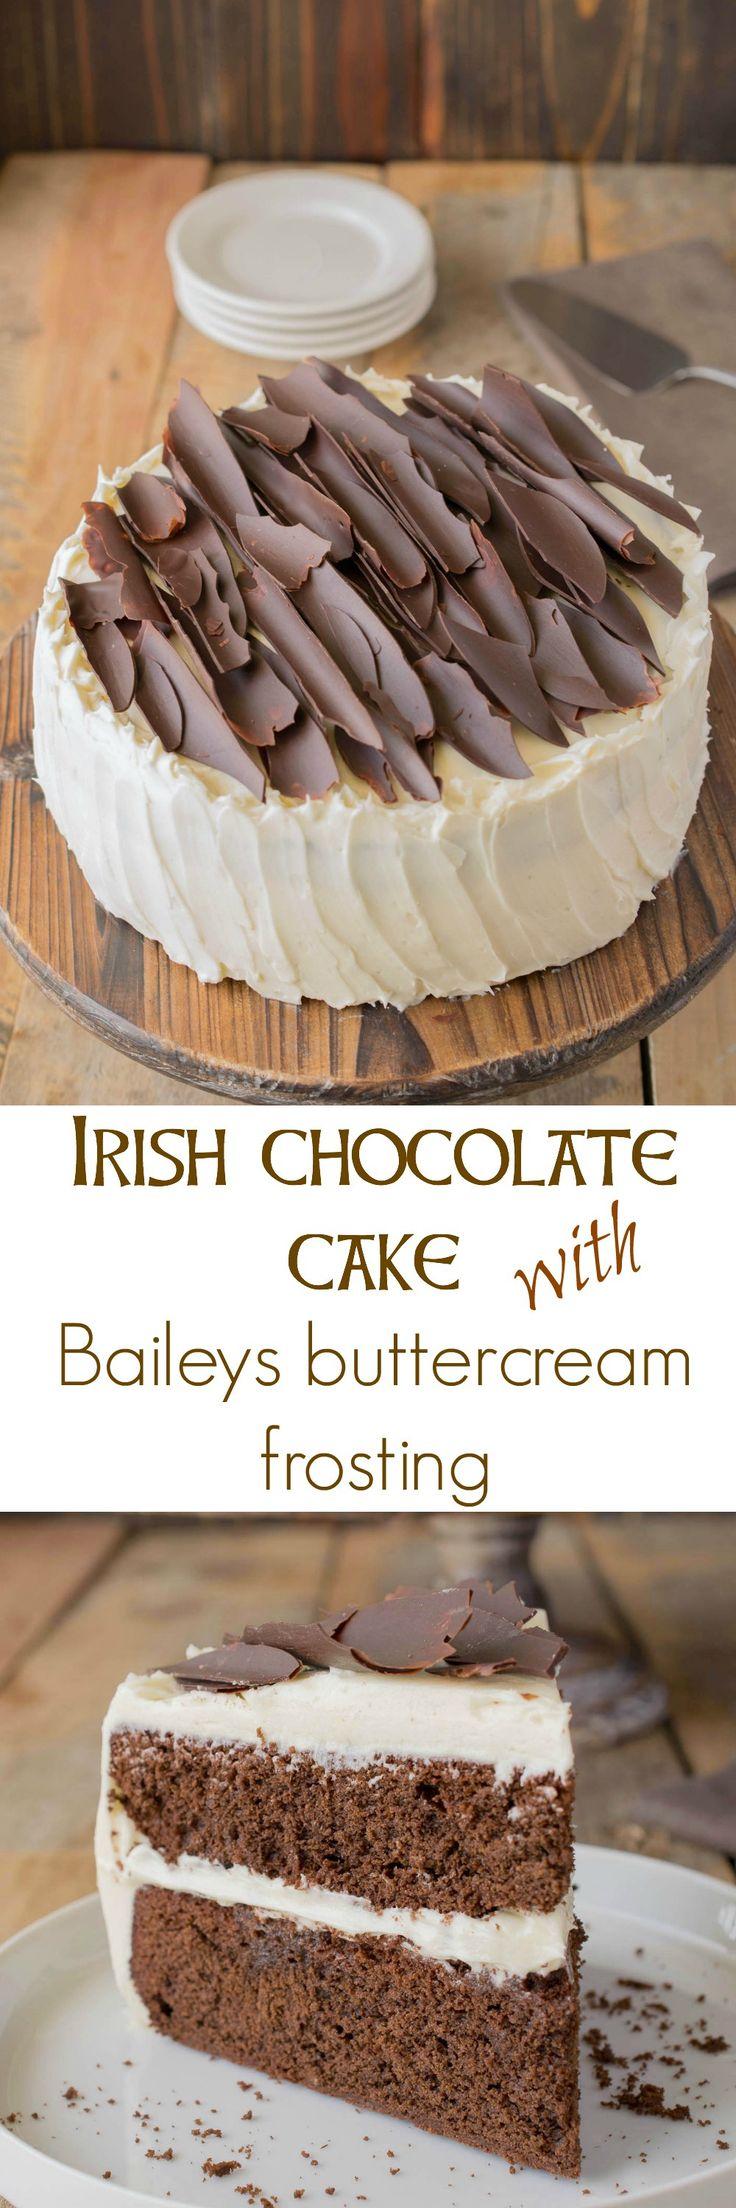 Irish chocolate cake with Baileys buttercream frosting